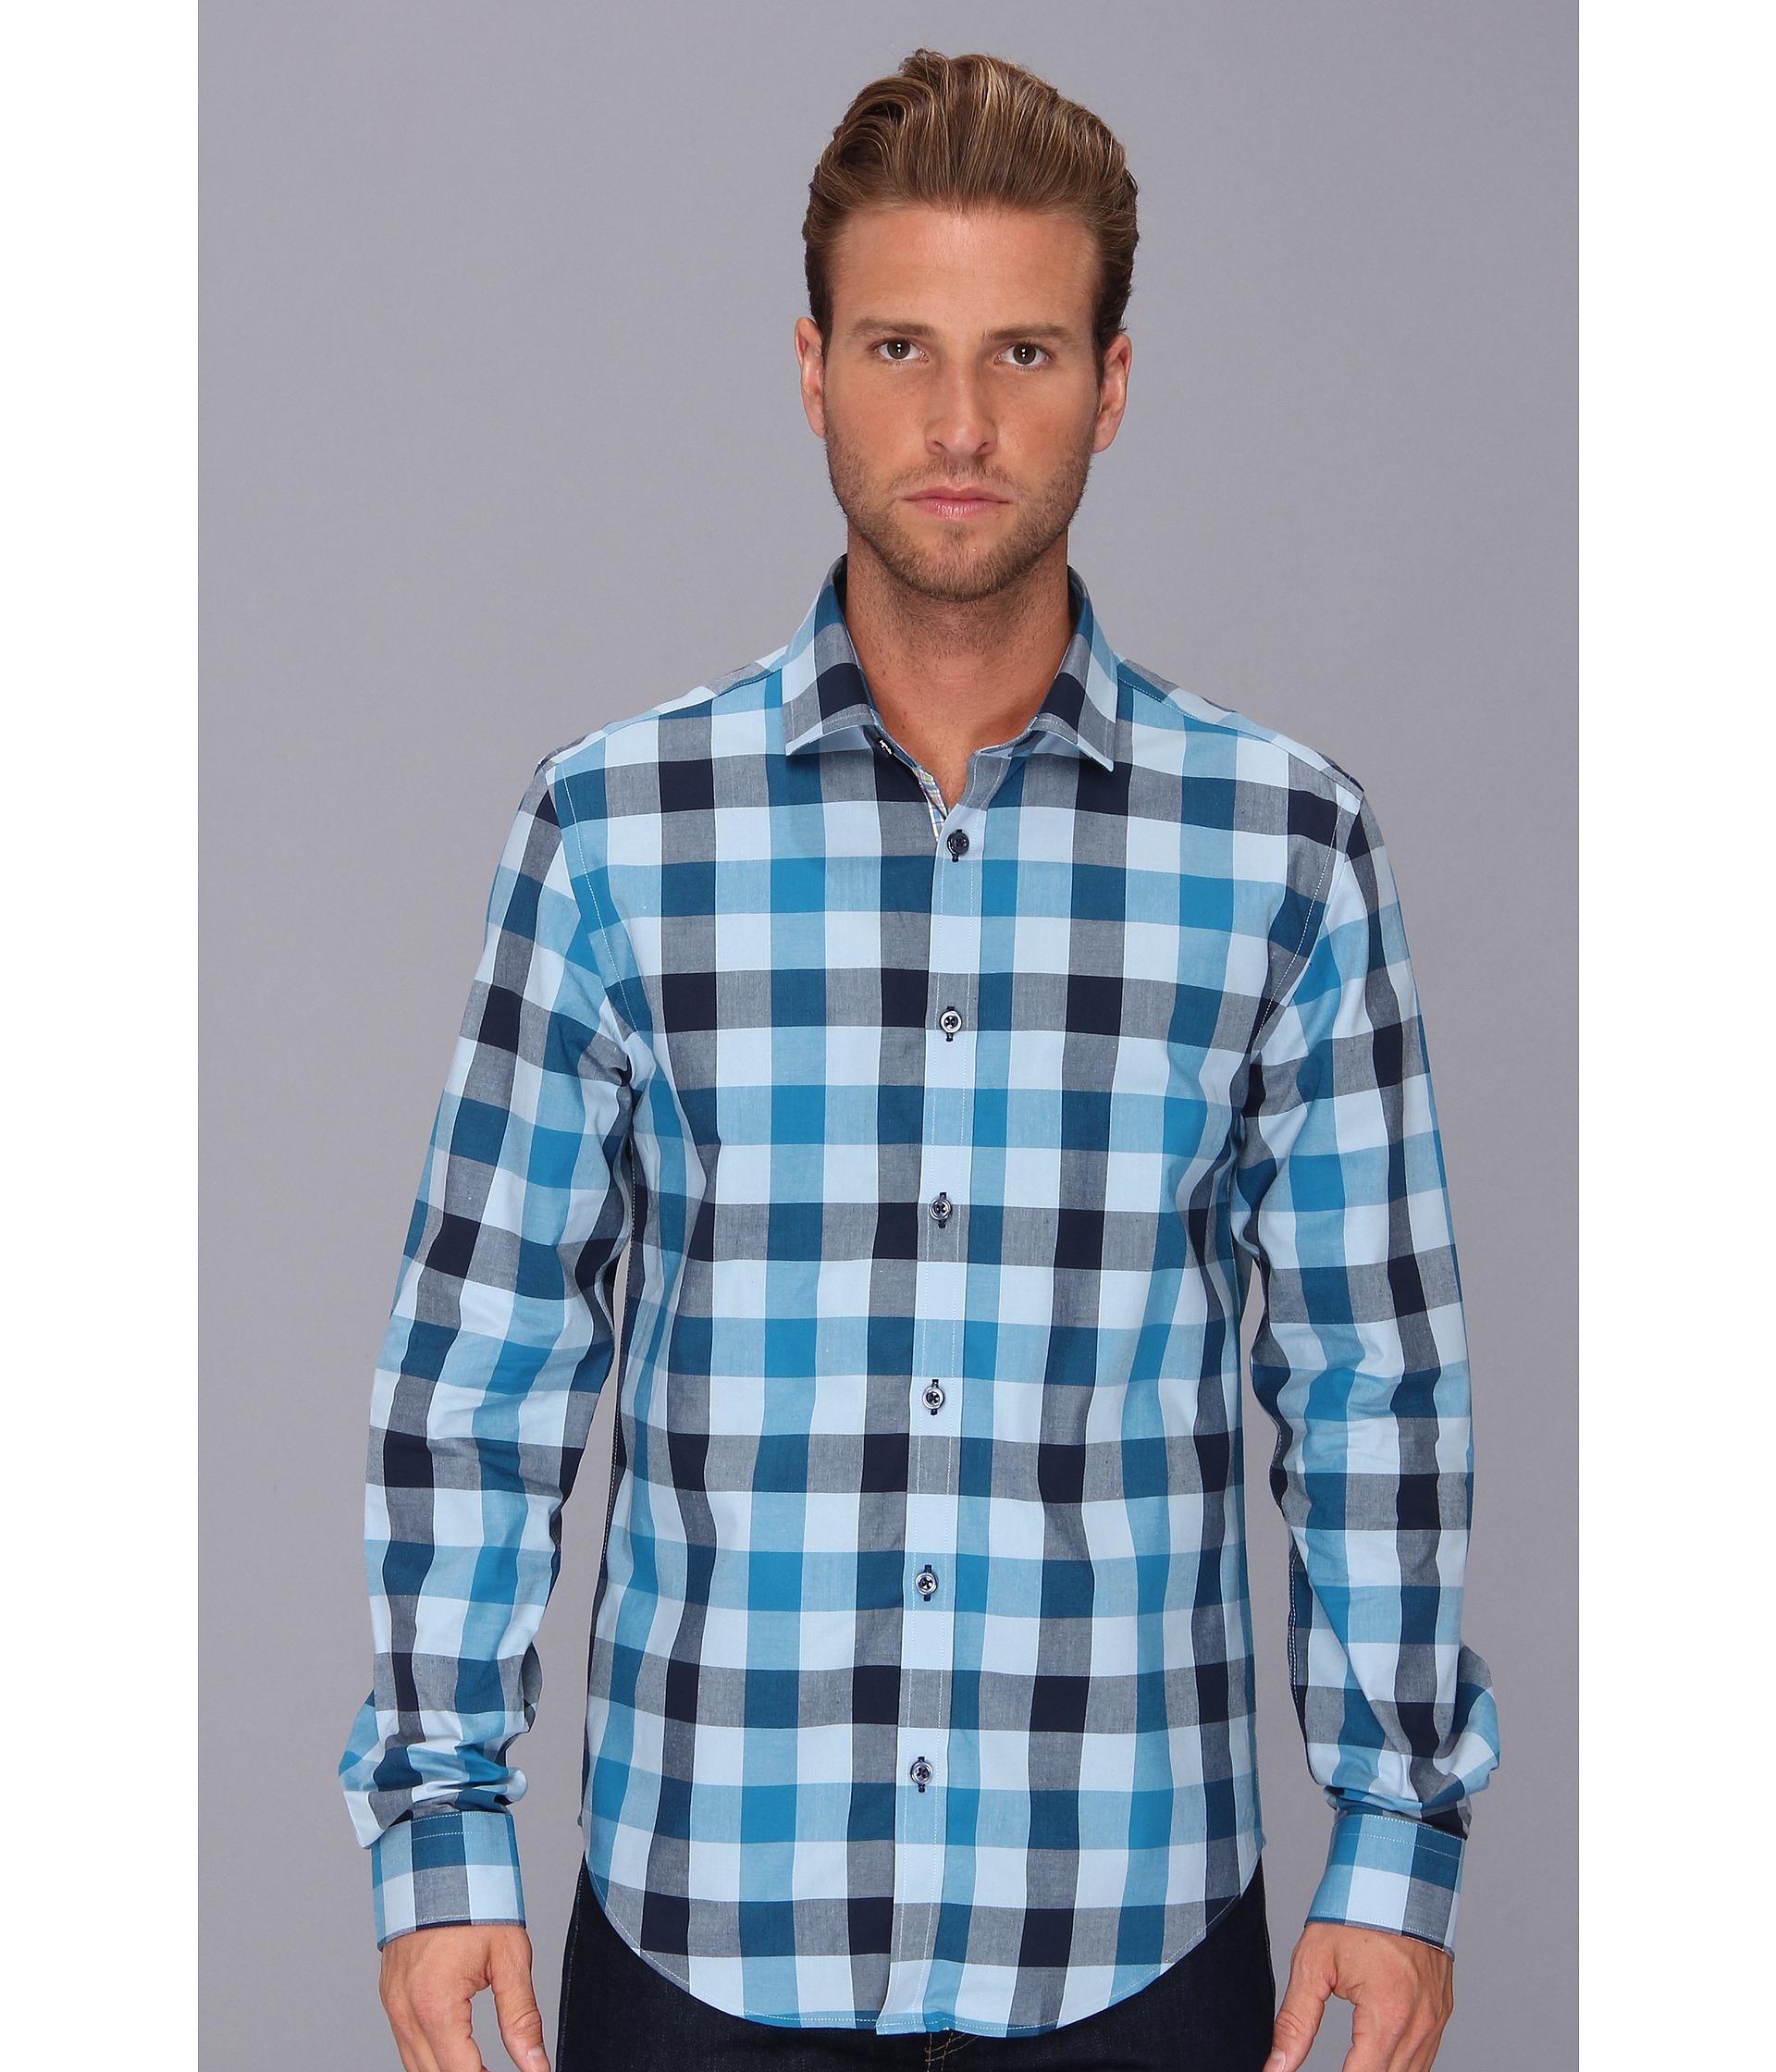 e796e251866 Lyst - Moods Of Norway Slim Fit Arne Vik Check Shirt in Blue for Men